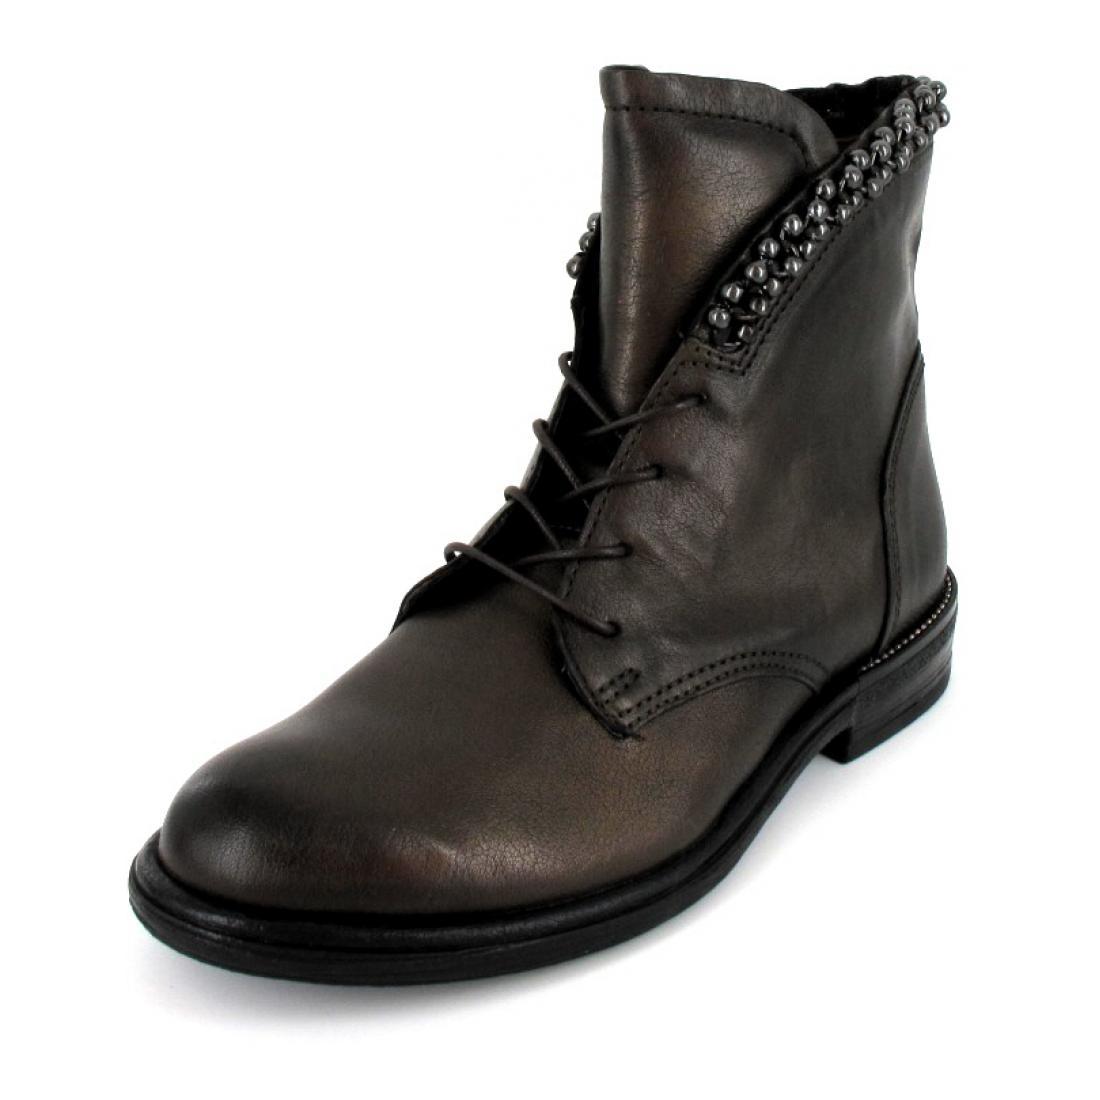 Mjus Boots PAL